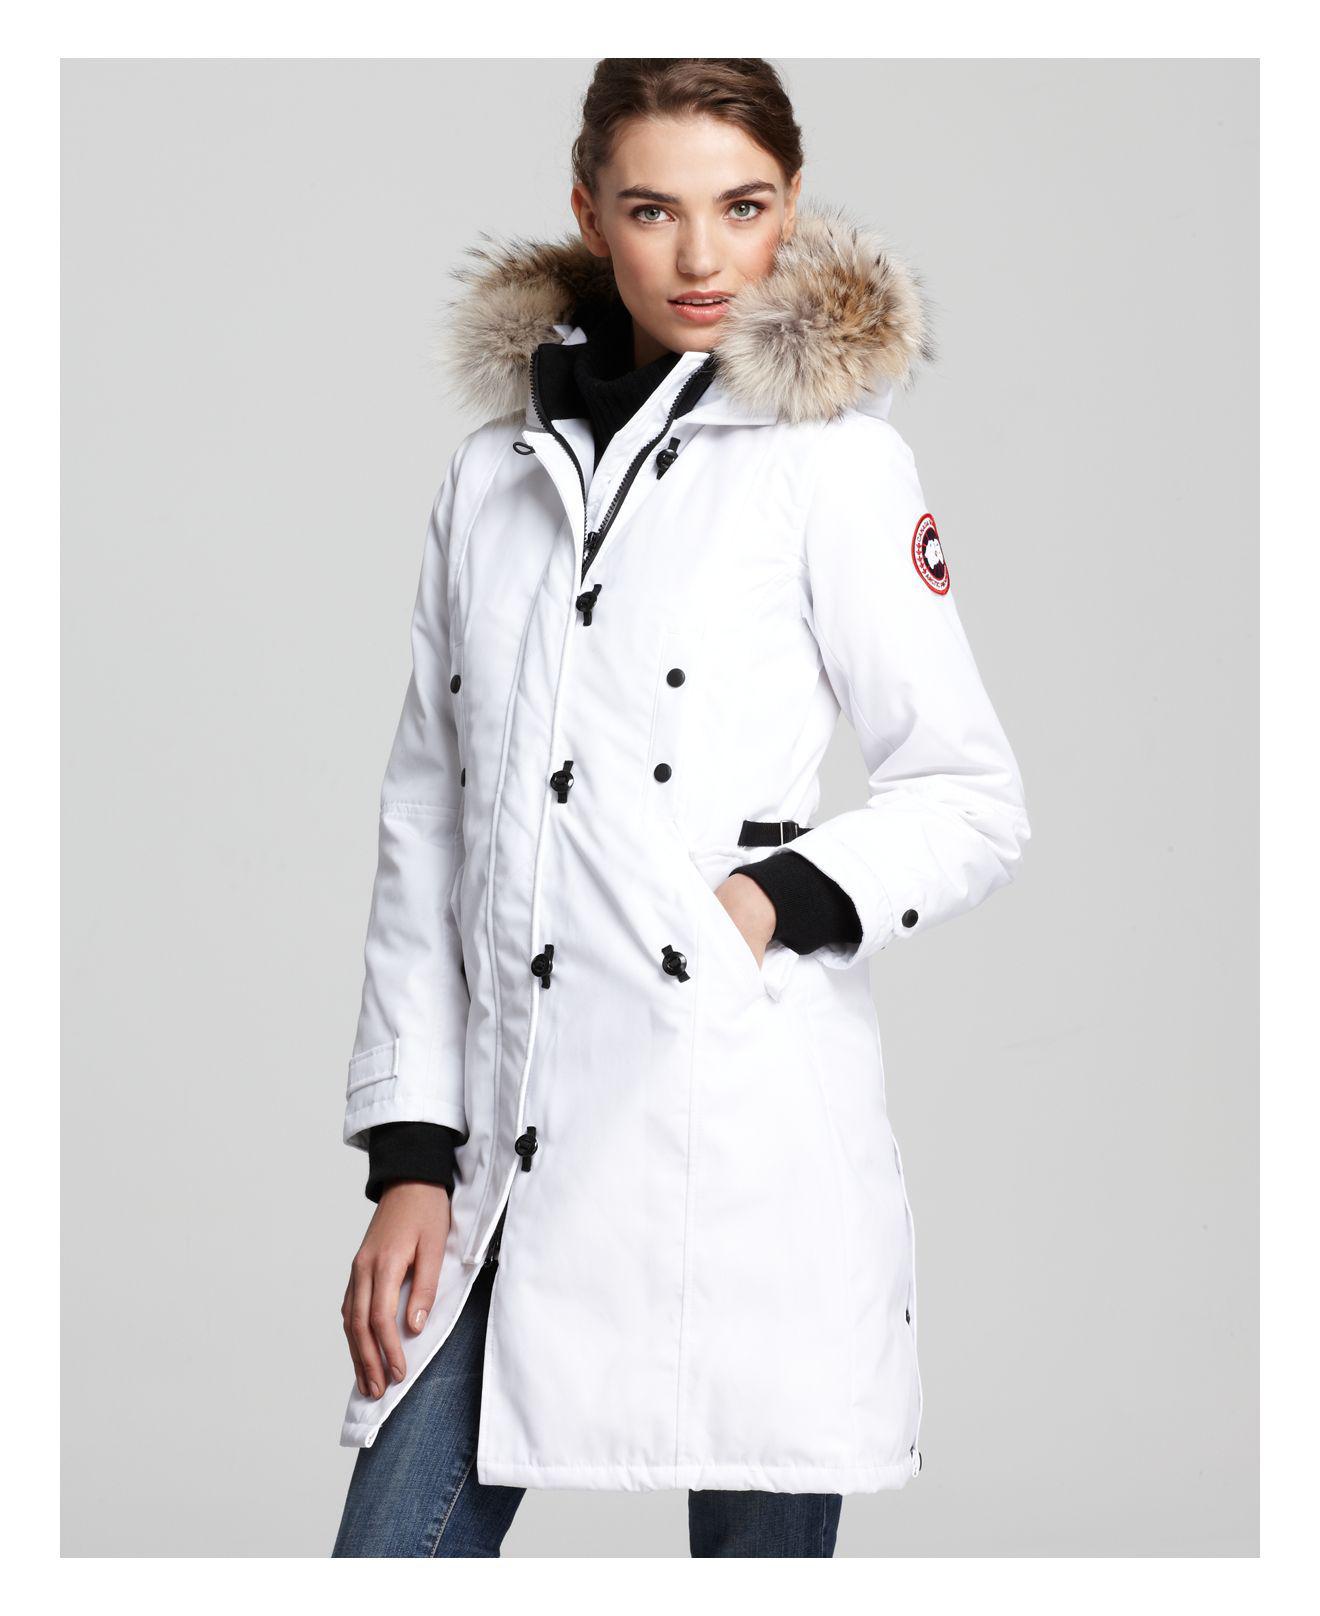 837306636c26 Canada Goose Womens Kensington Jacket